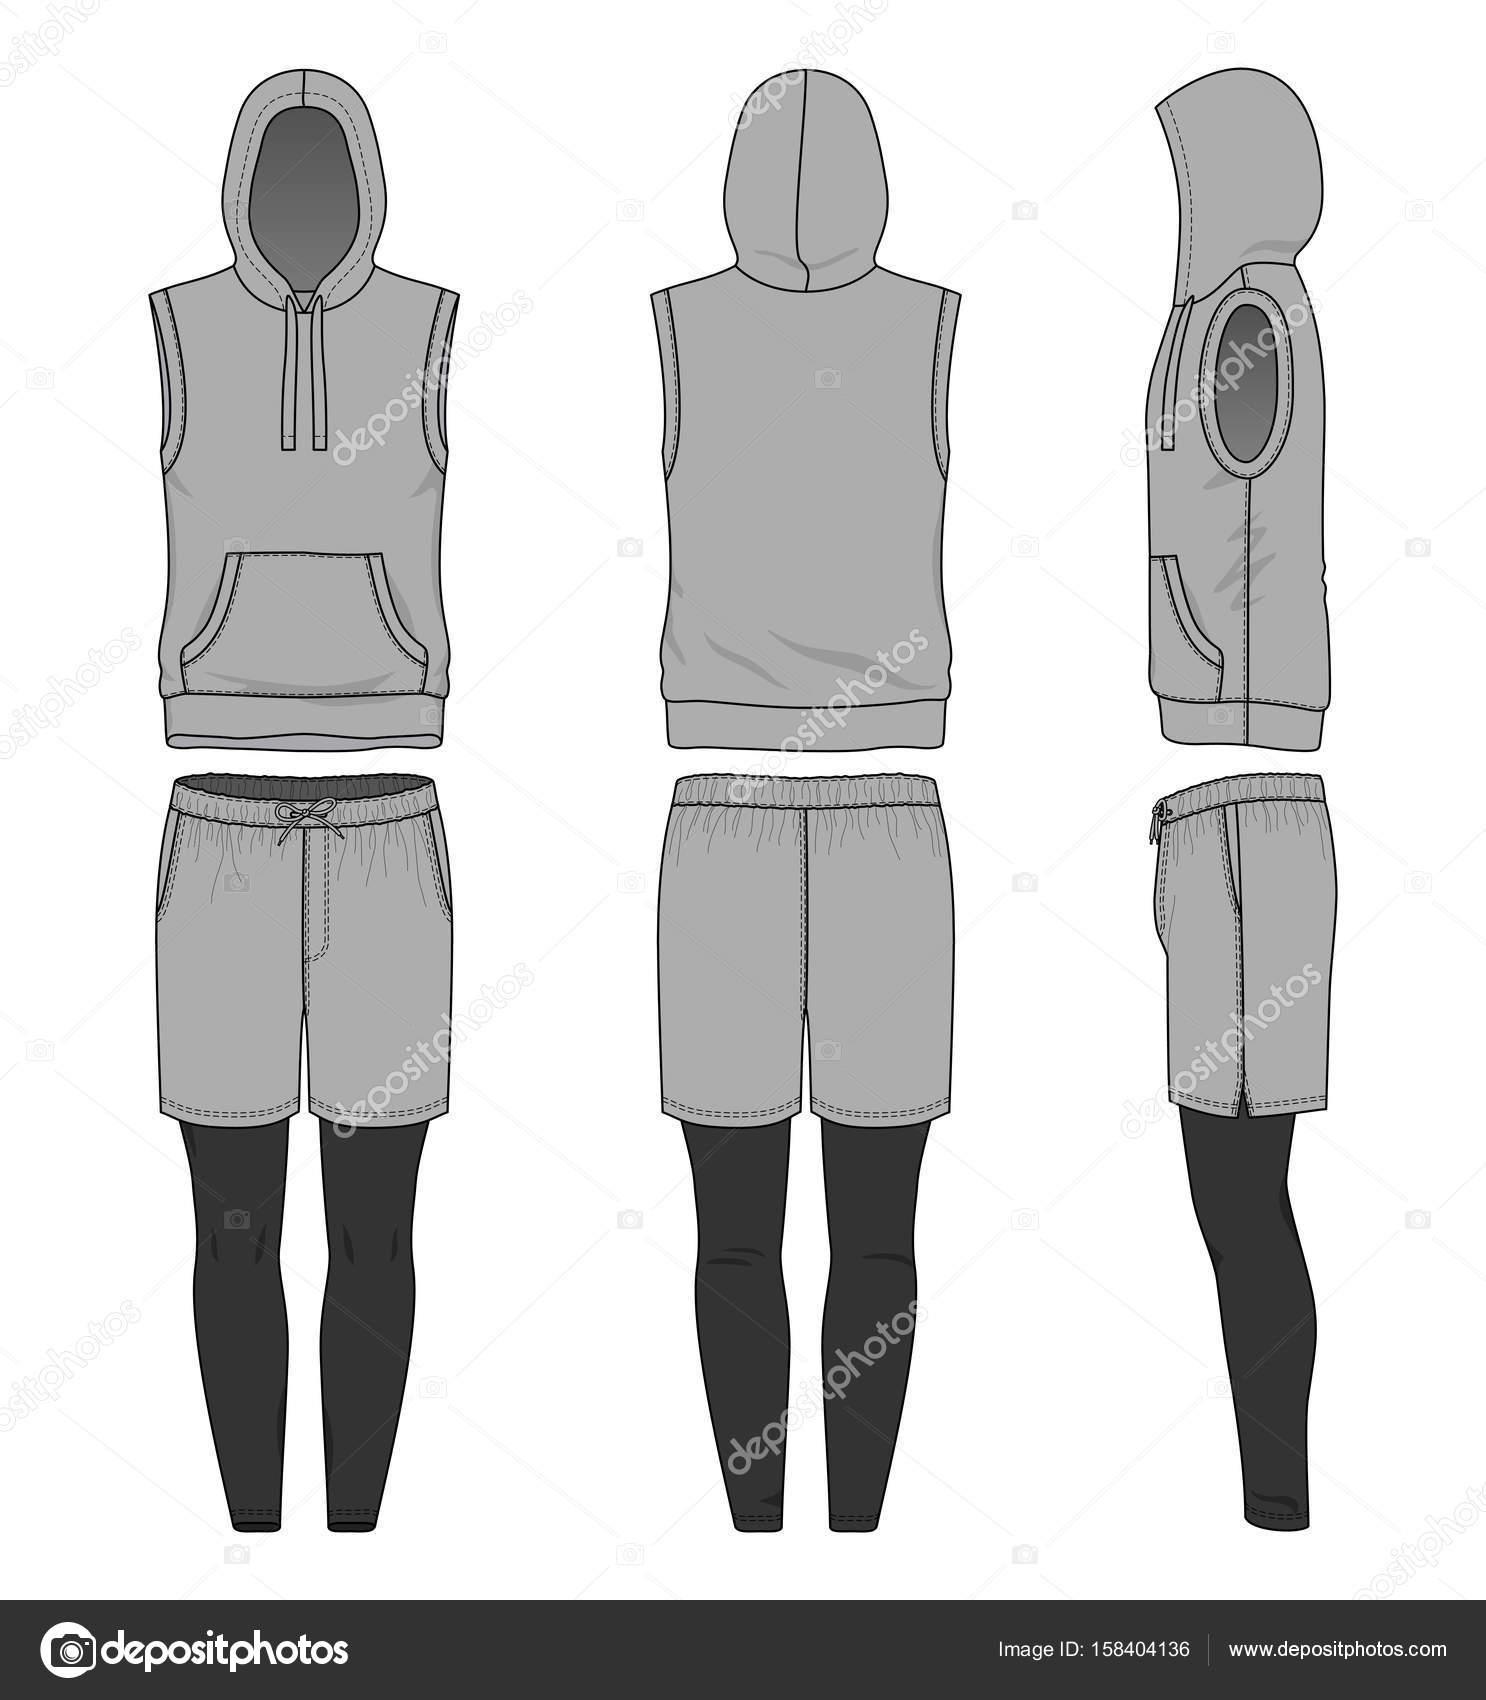 blank clothing templates vector illustration sleeveless hoody shorts jogging pants stock vector